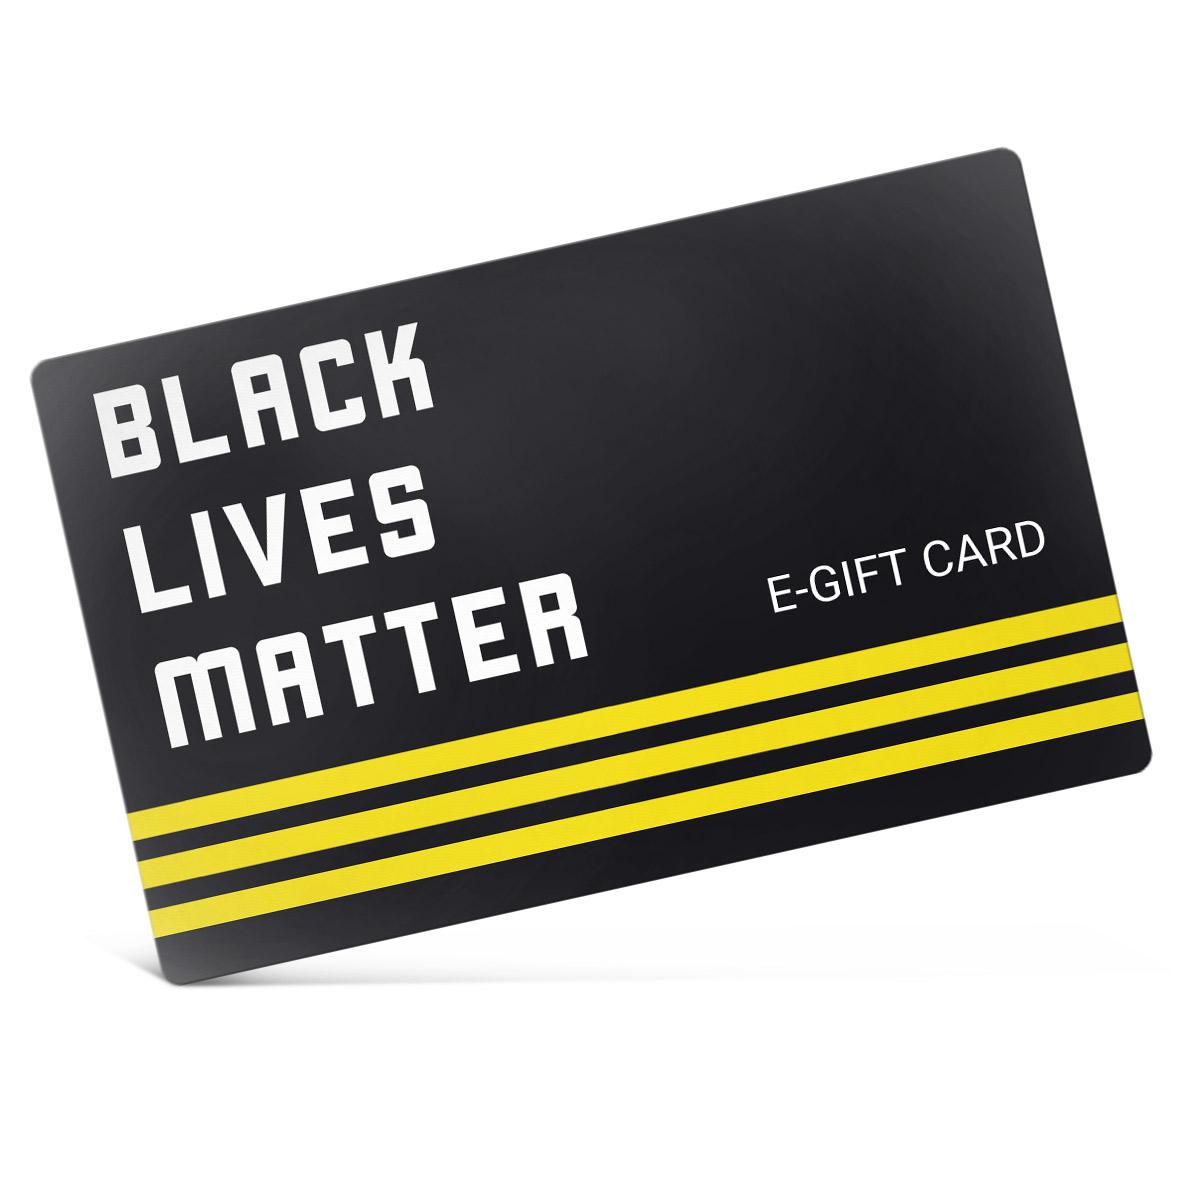 Black Lives Matter Official Store eGift Card